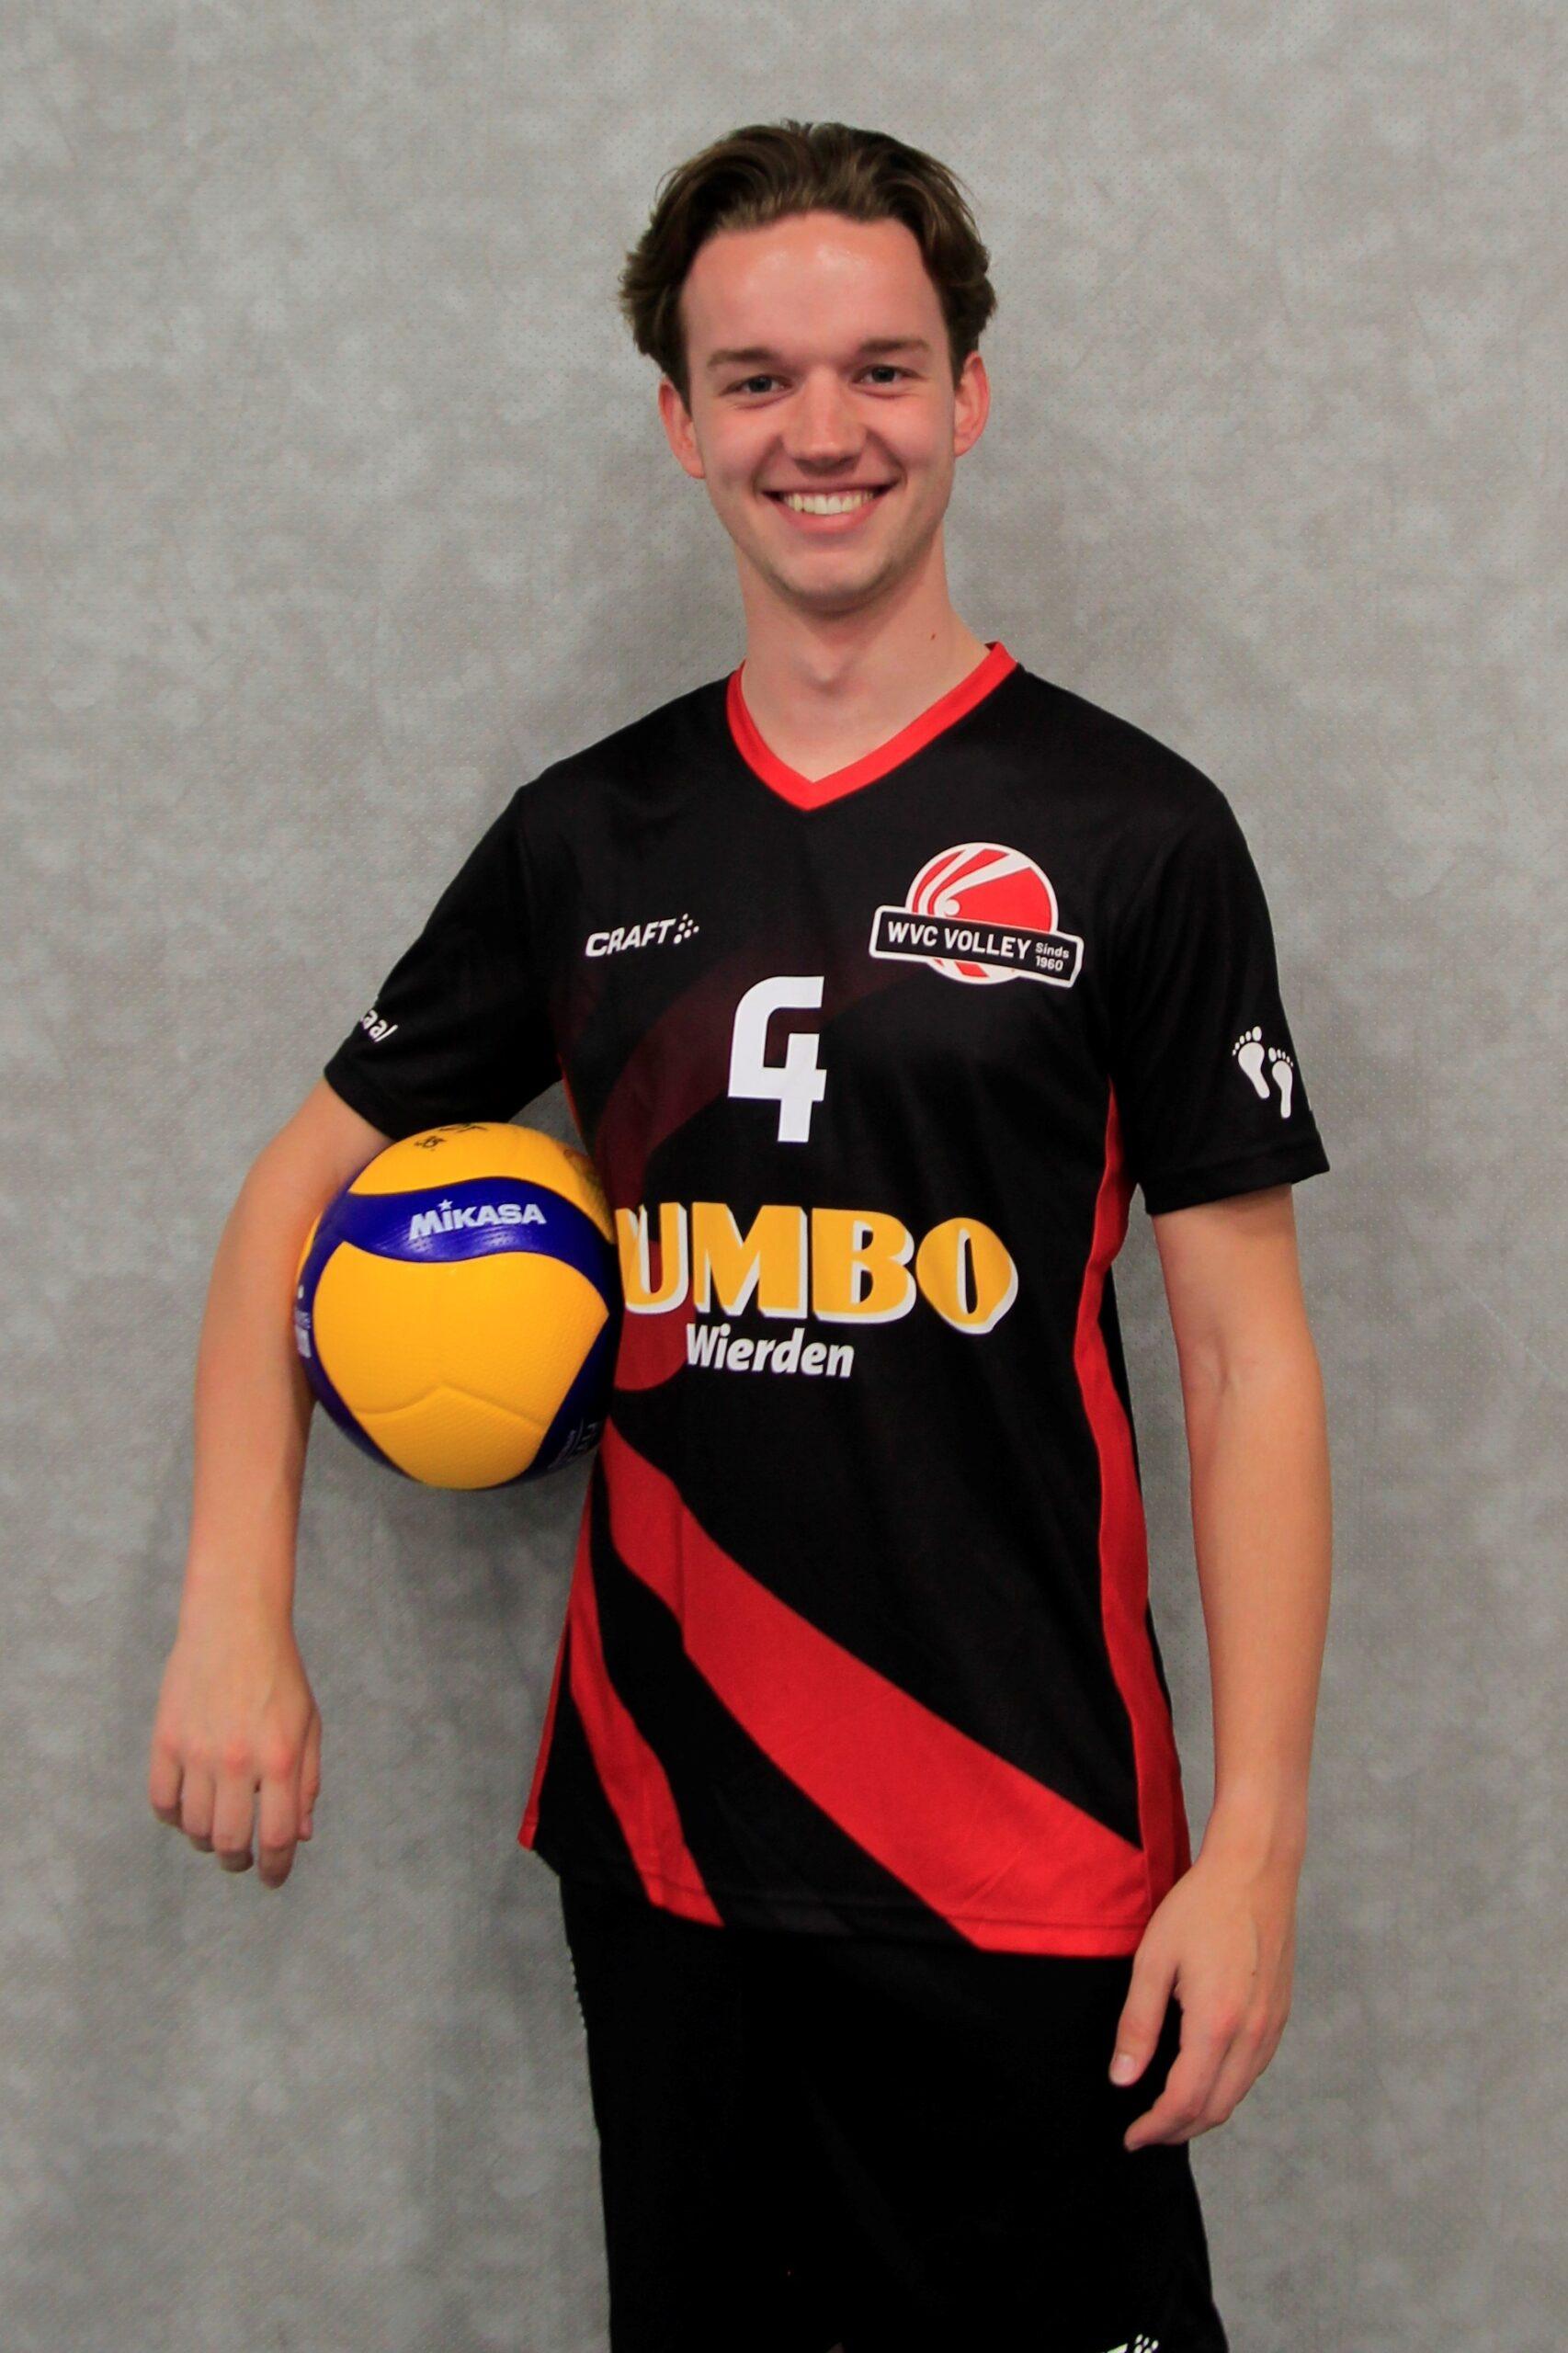 Mart Wassink (C)